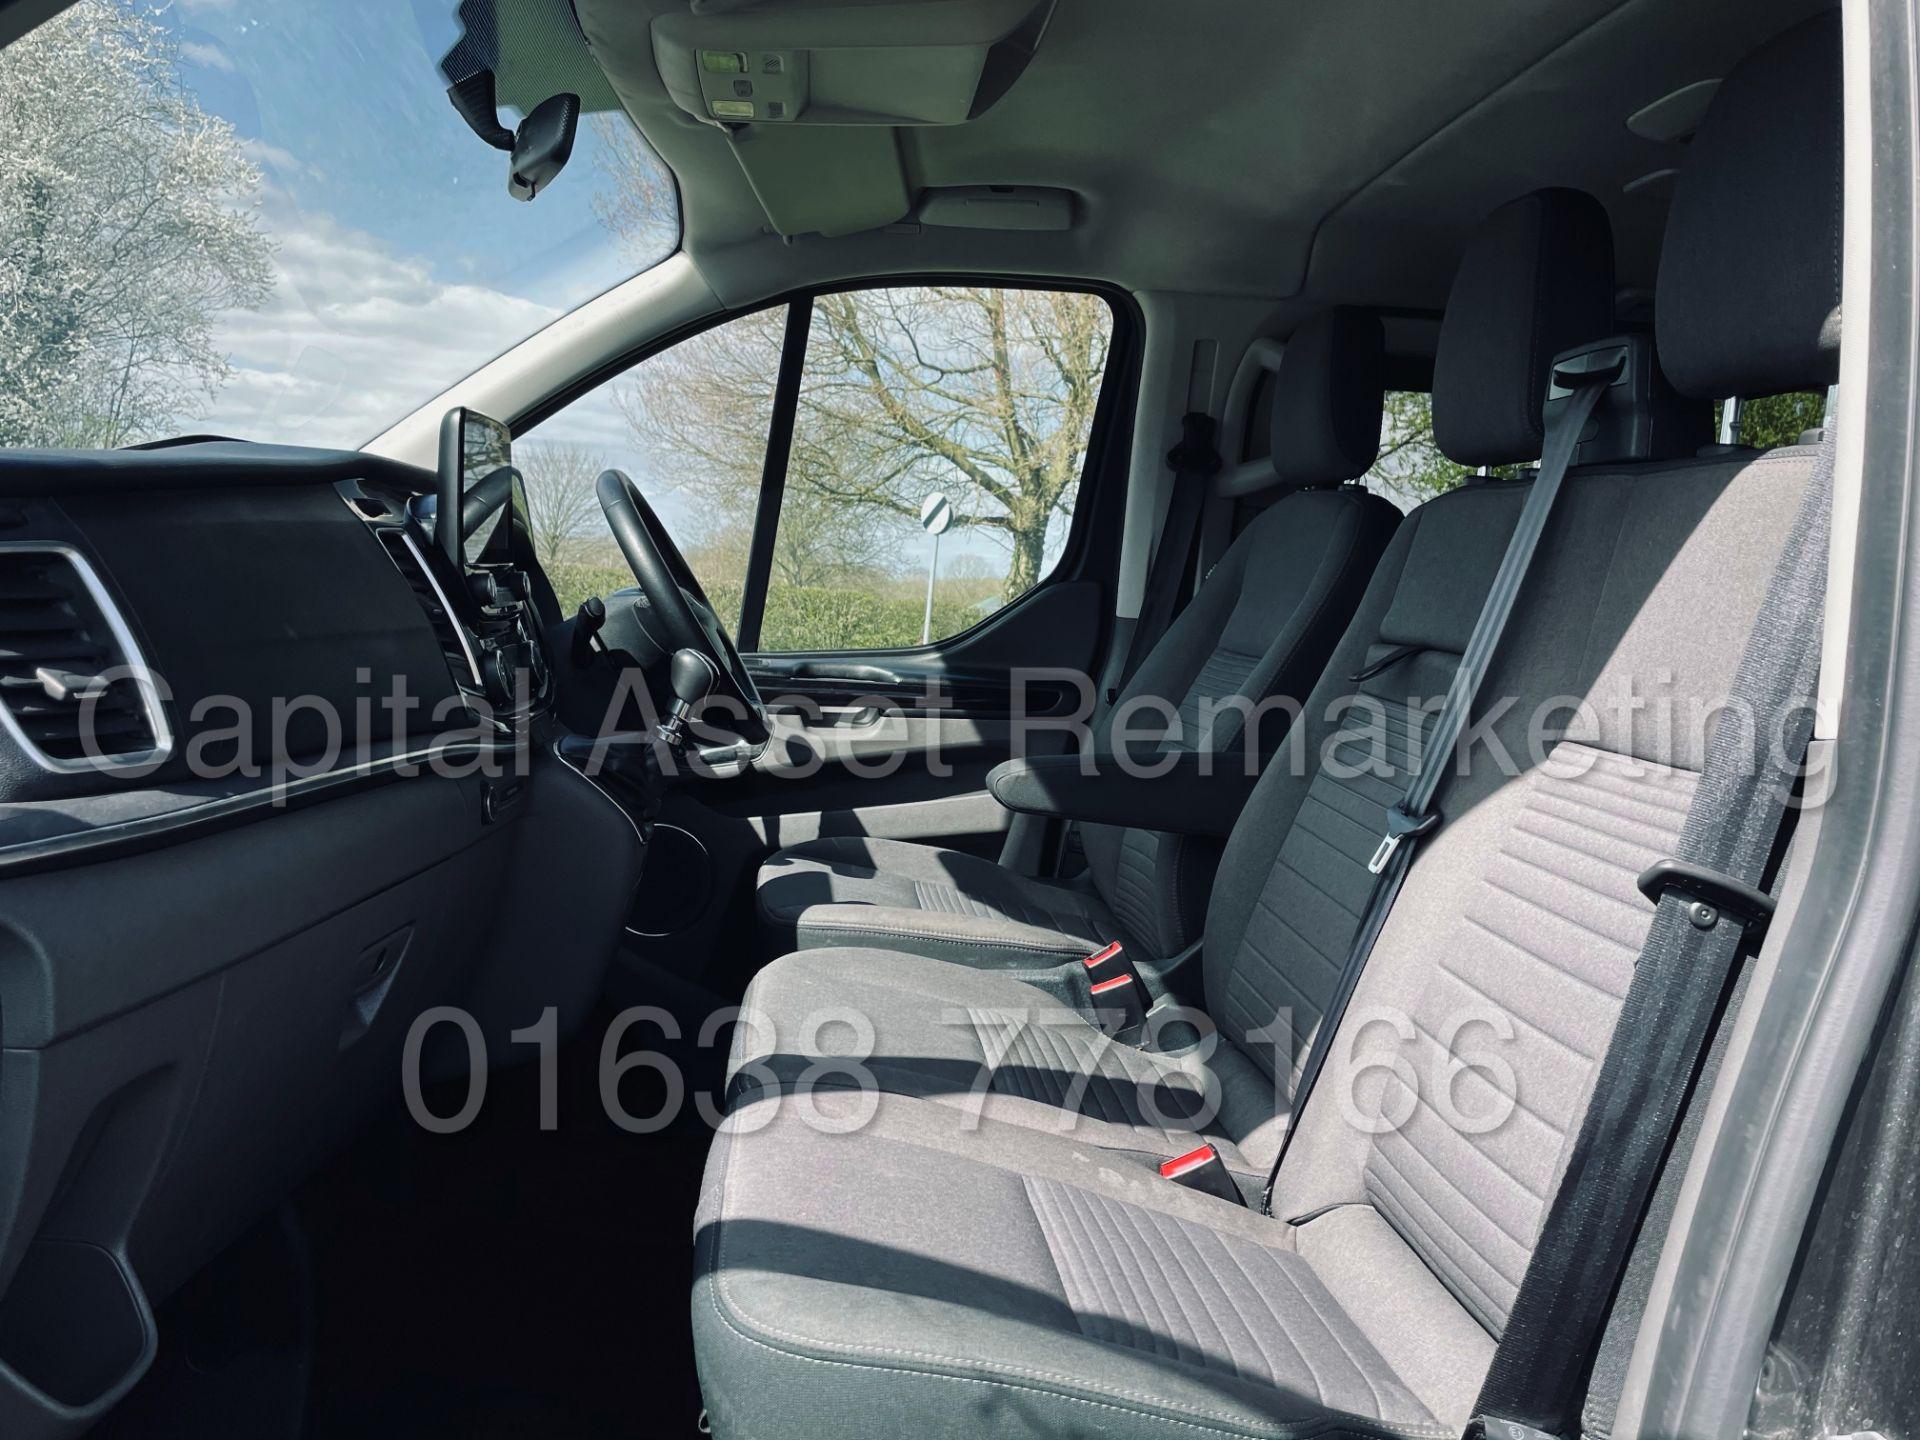 FORD TRANSIT CUSTOM TOURNEO *TITANIUM - 9 SEATER MPV / BUS* (2019 - EURO 6) '2.0 TDCI' *SAT NAV* - Image 25 of 56